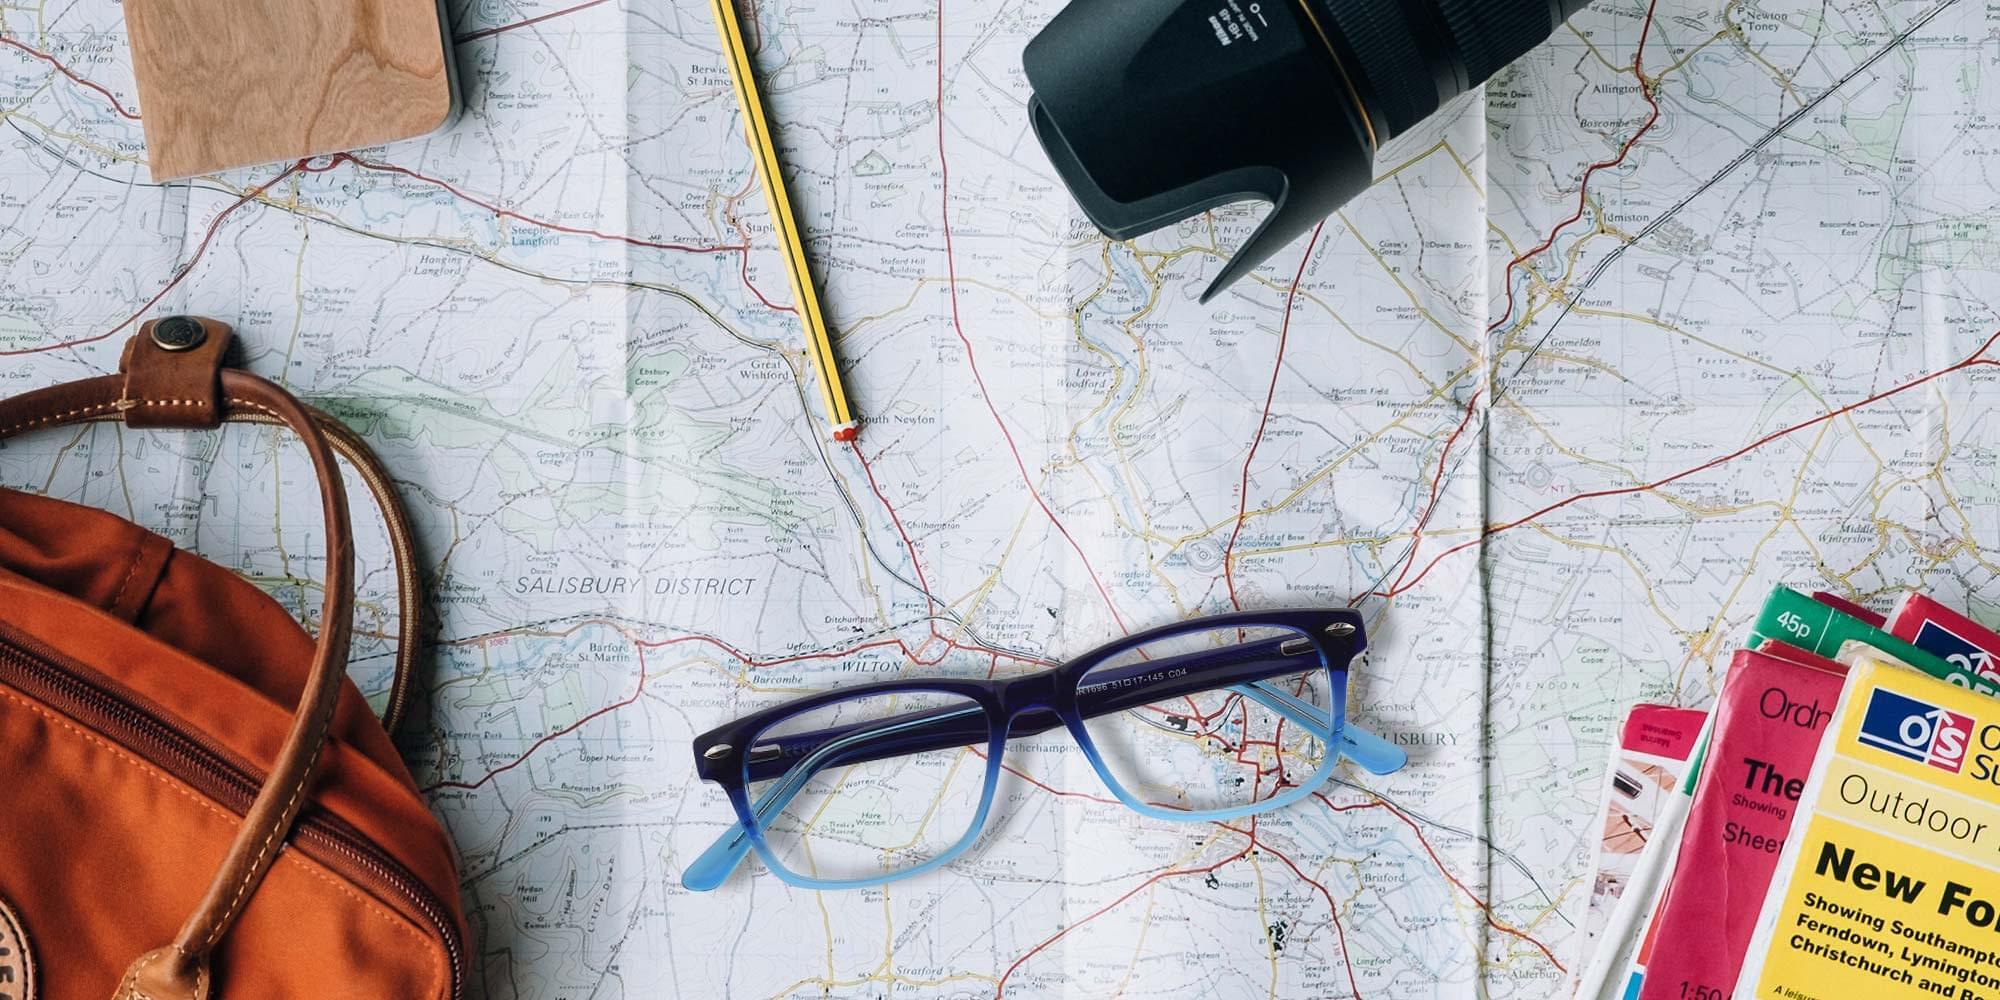 Wayfarer-Inspired Glasses Collection